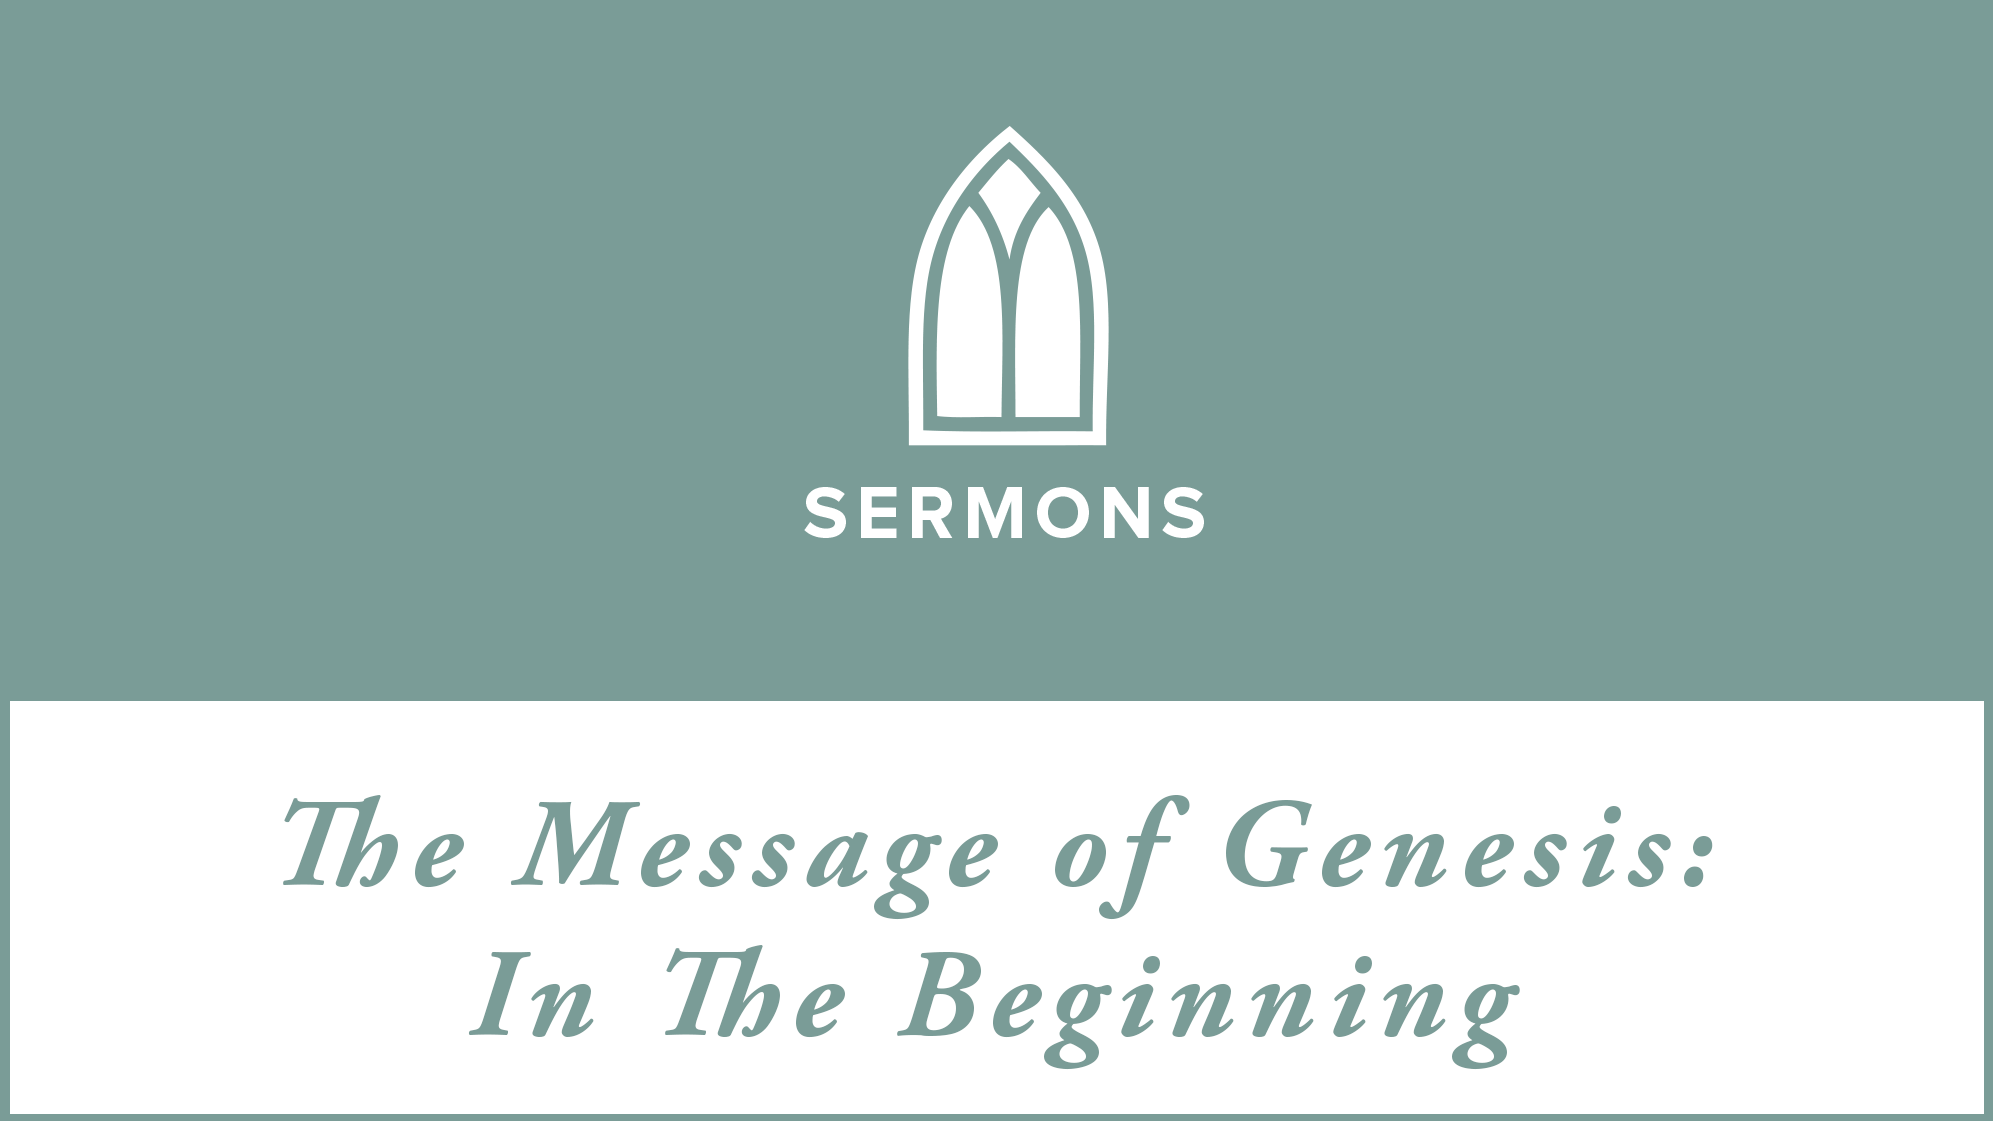 Genesis-in-the-beginning-16x9.png